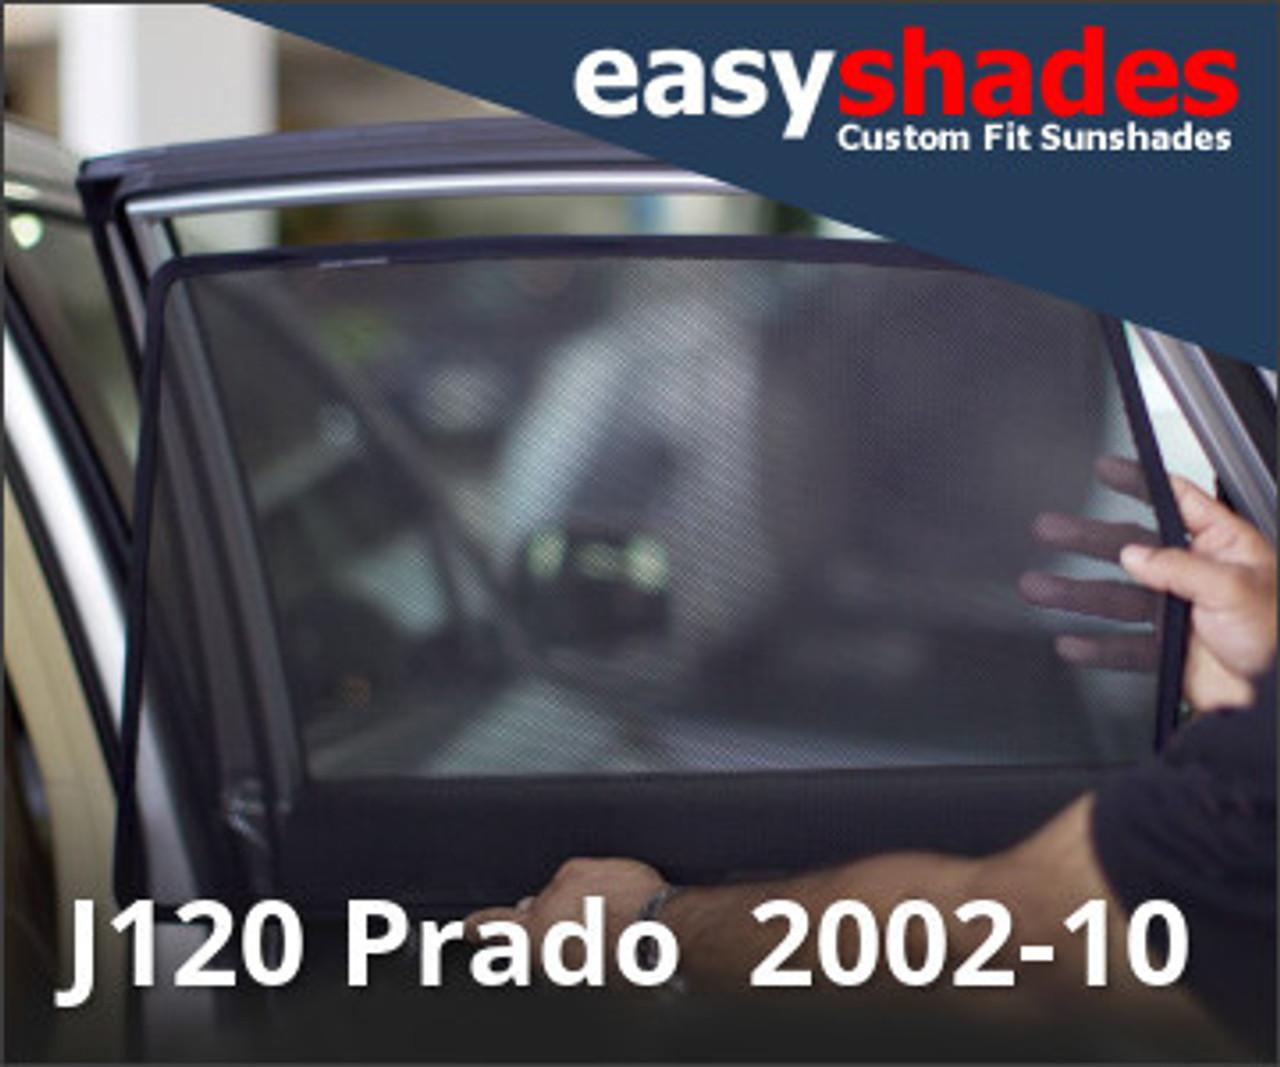 2002-10  J120 Prado LC3